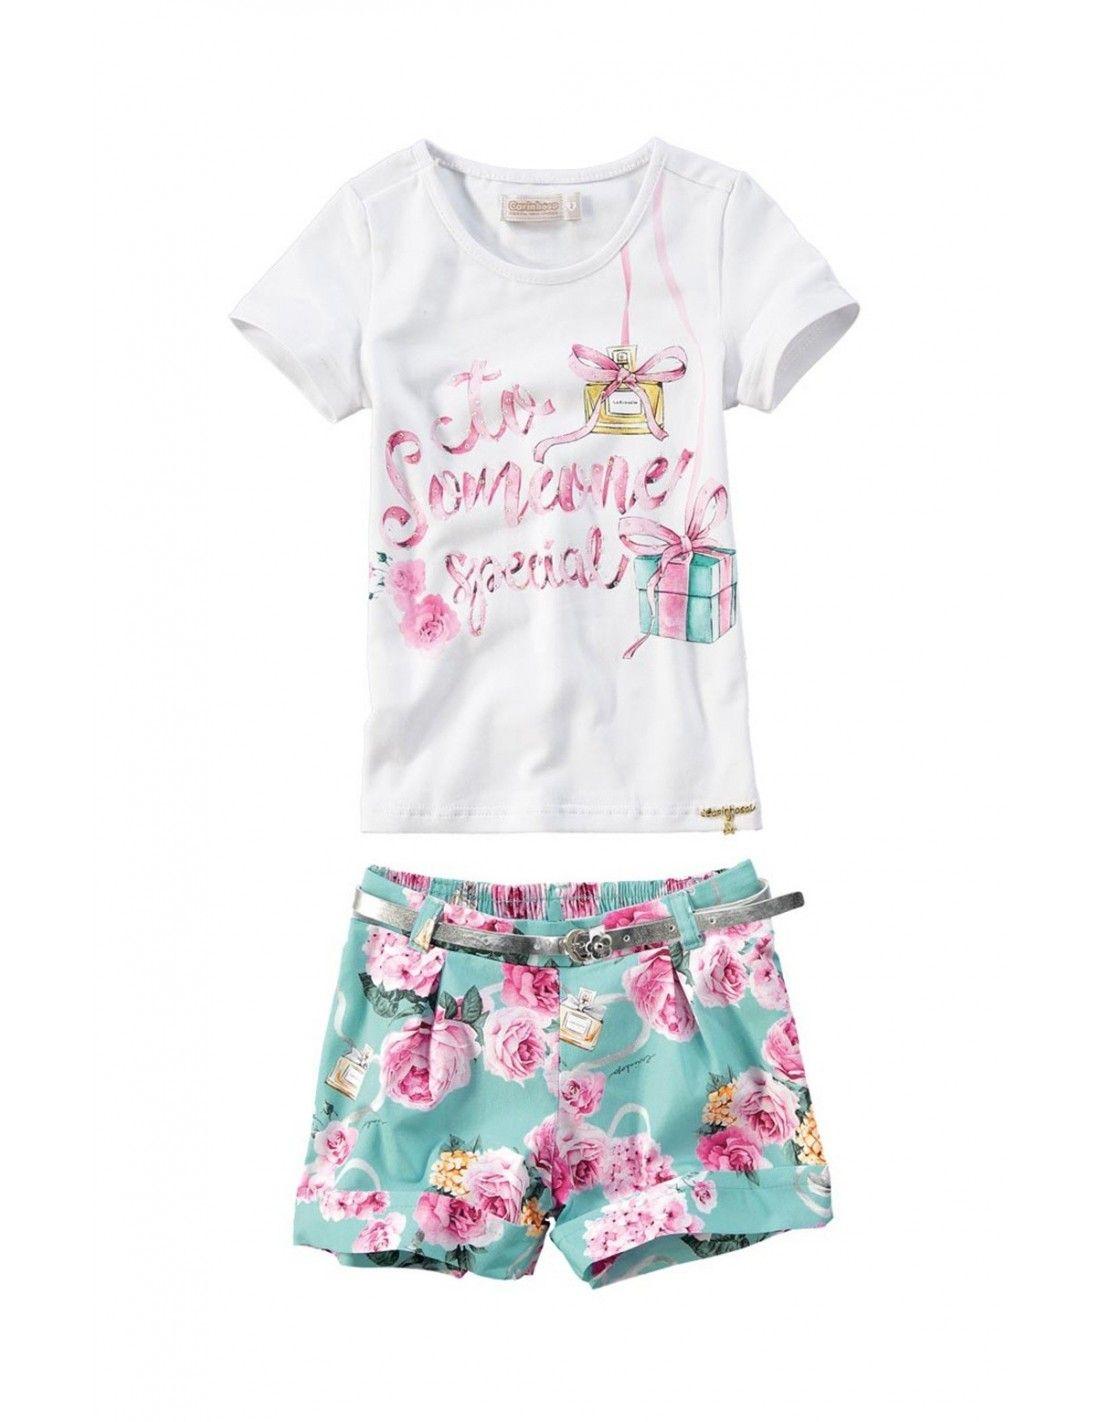 71597e3f4c moda infantil menino menina infantil malweekids malwee carinho zig zig zaa  conjunto moleton happy kids kid